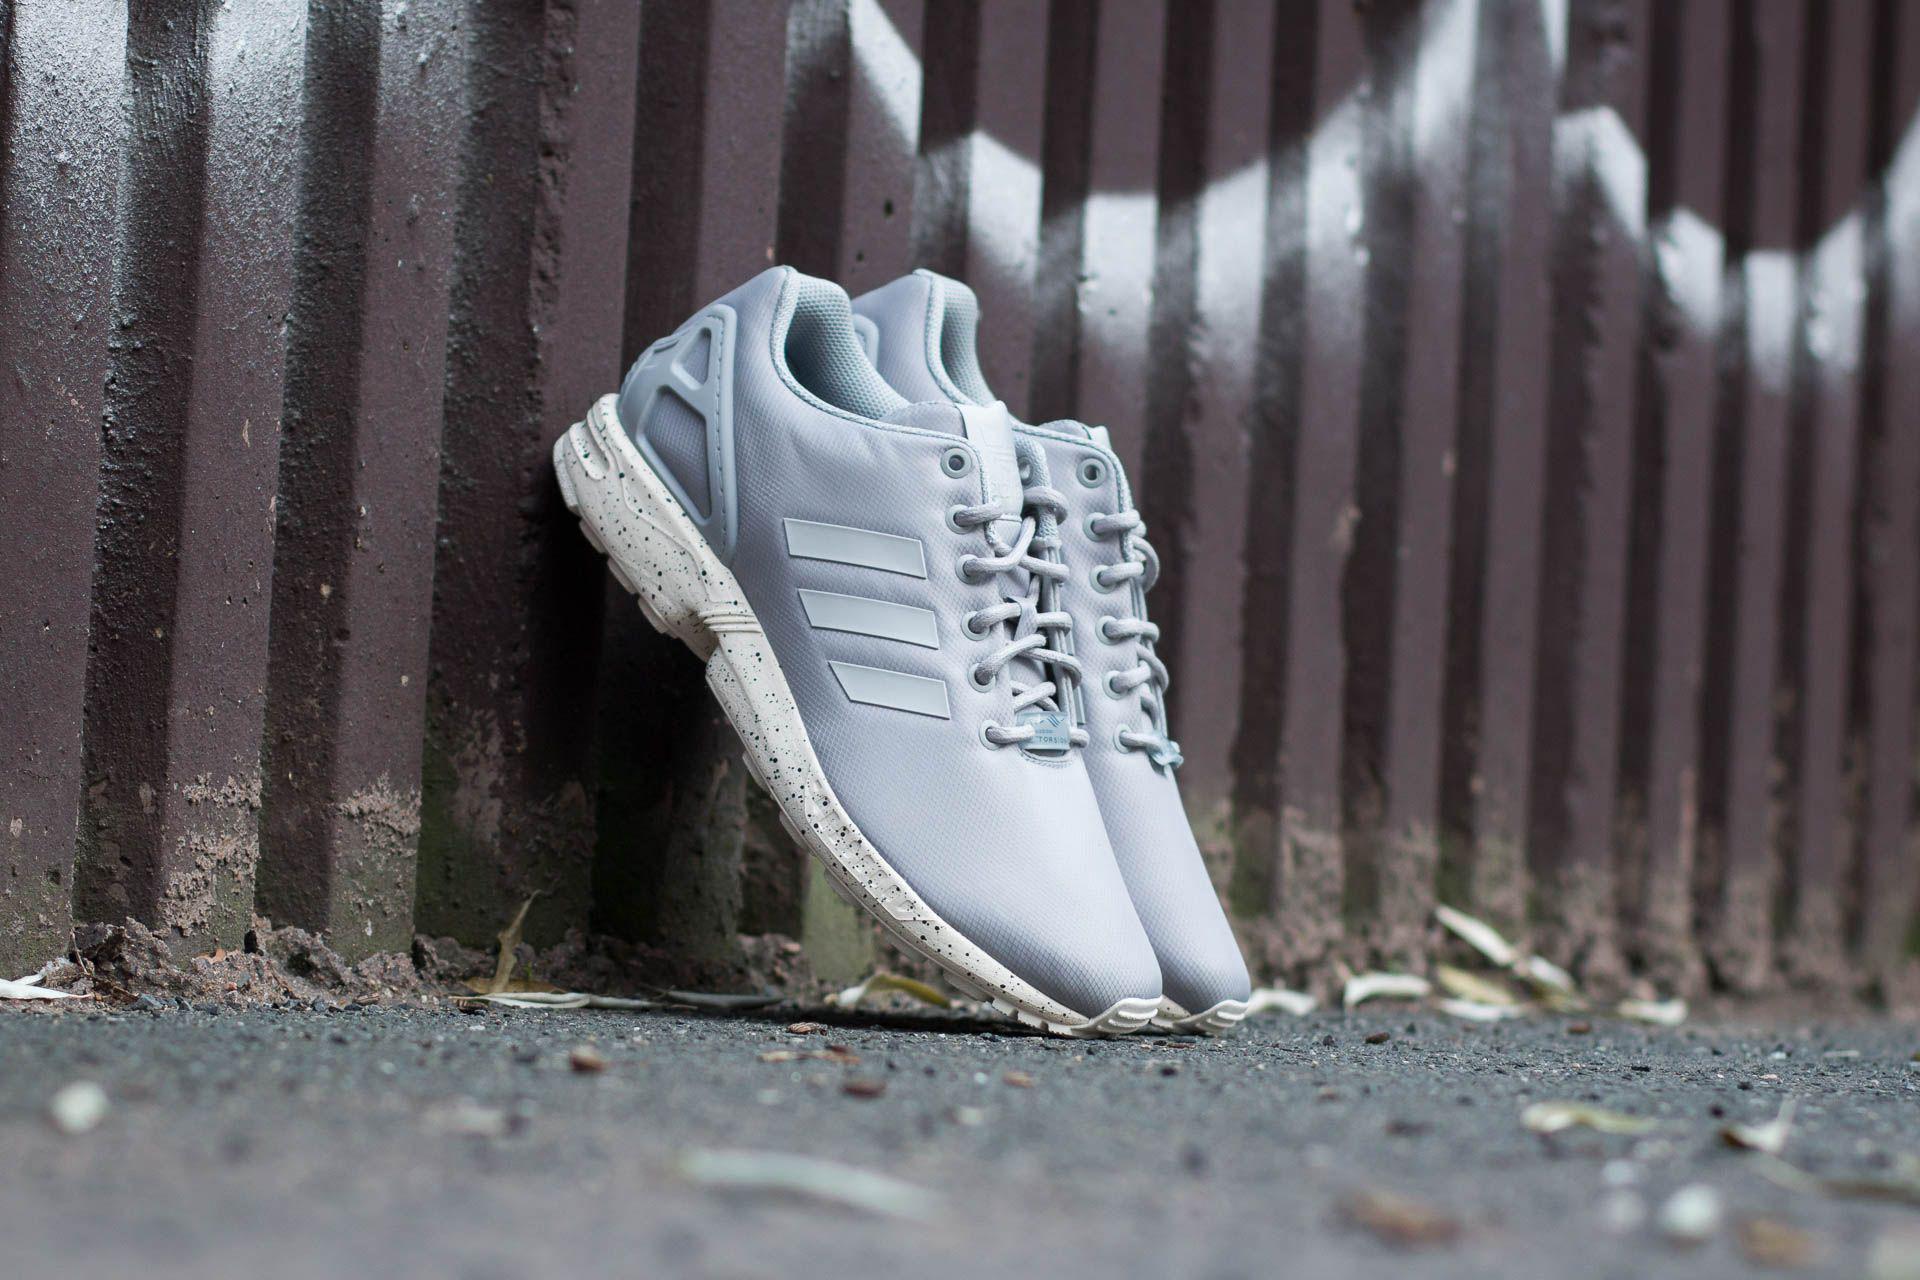 d7f6f973e463f ... where to buy lyst adidas originals adidas zx flux clear onix grey chalk  white 86923 f8c2a